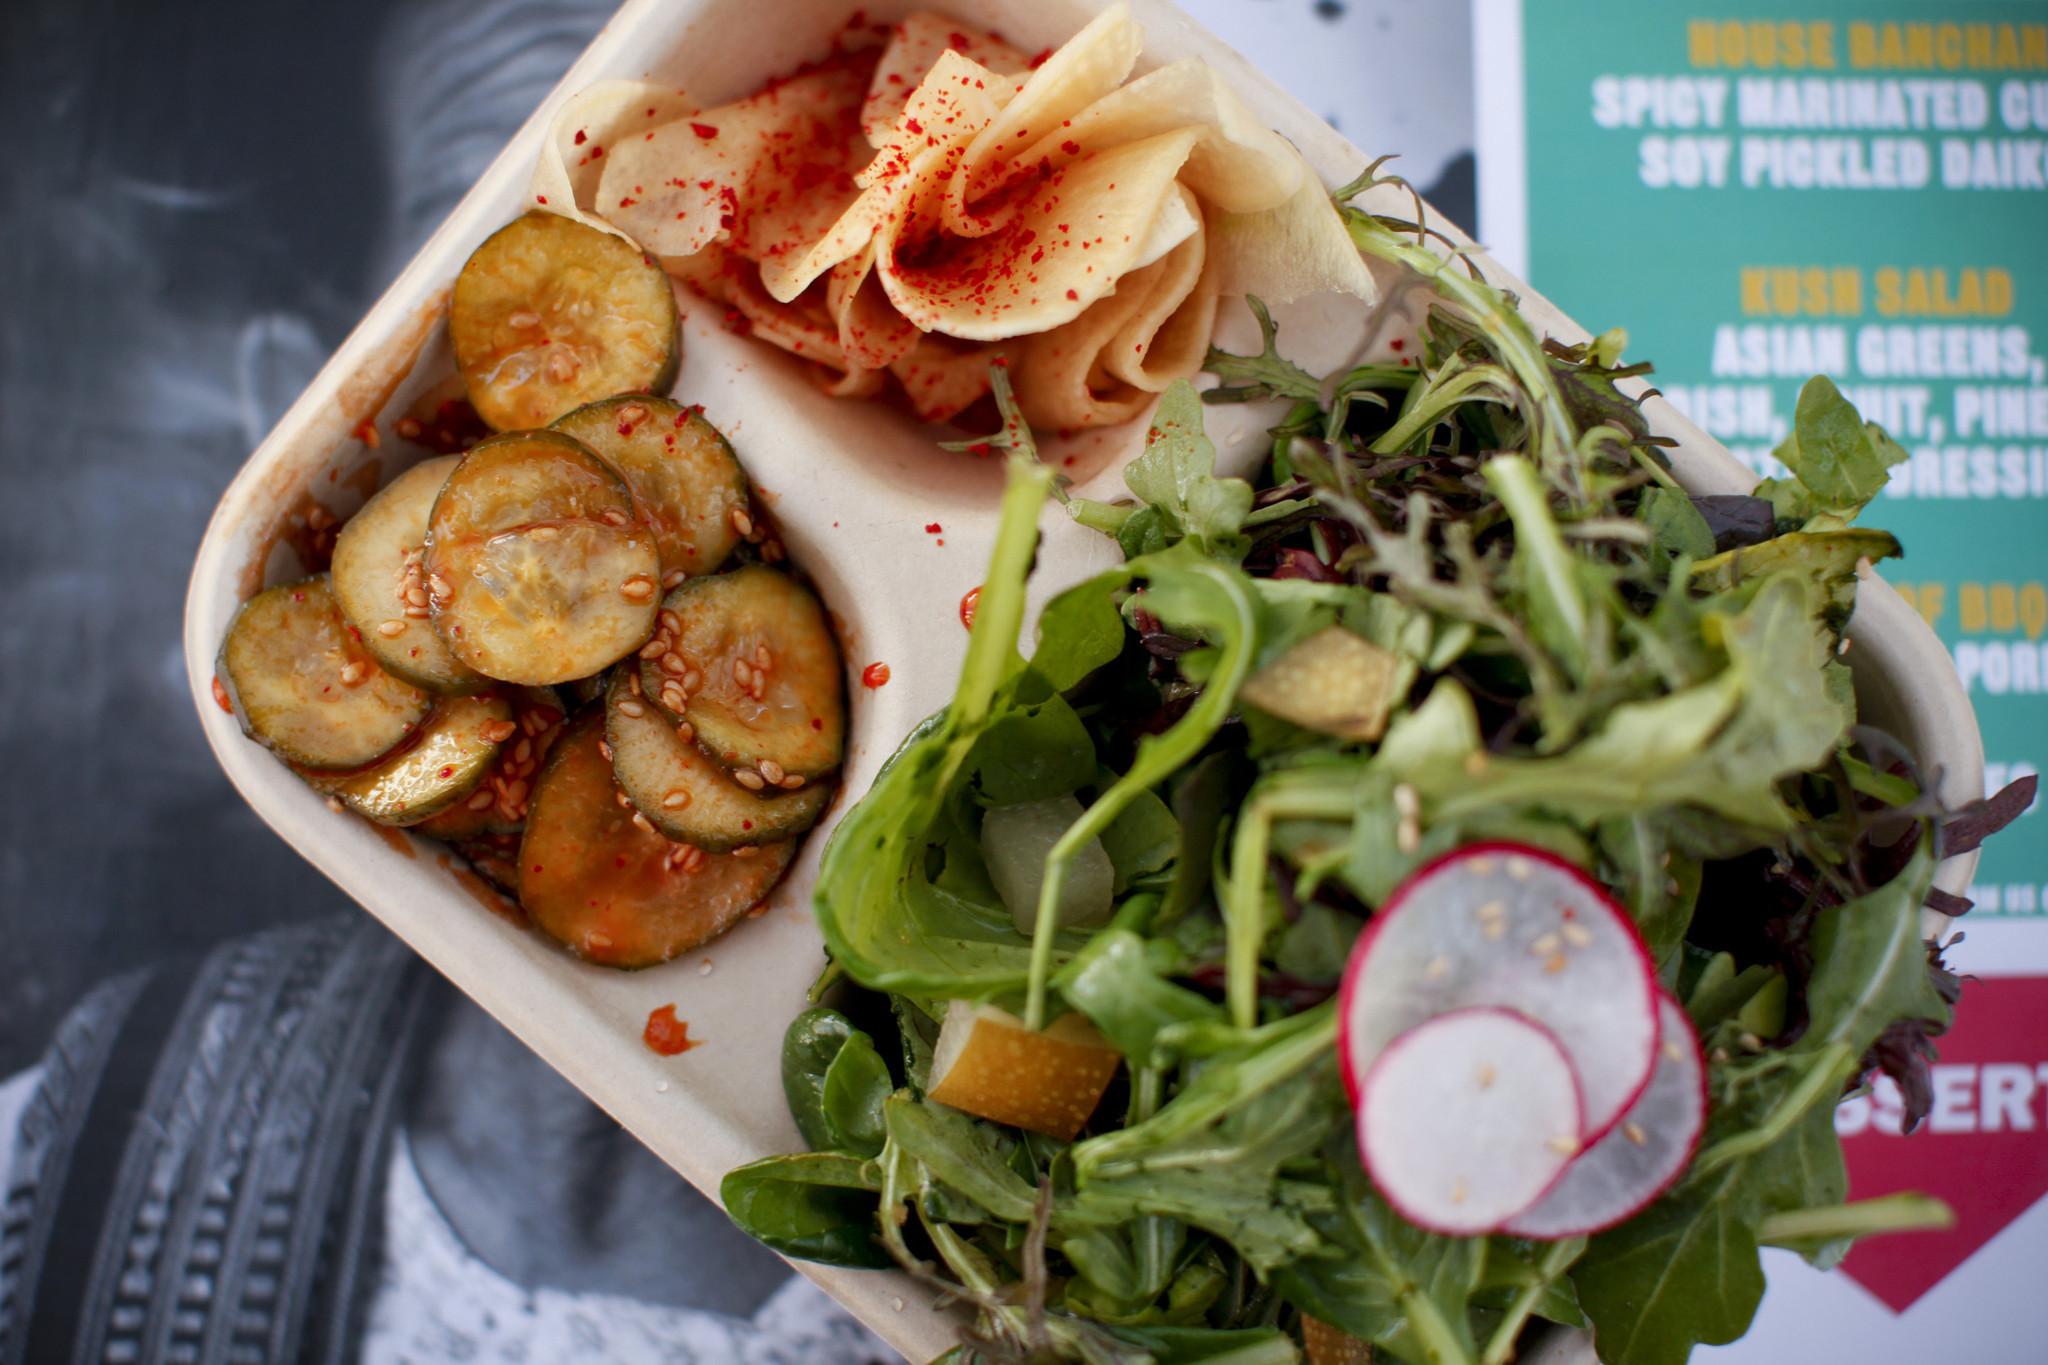 coachella food